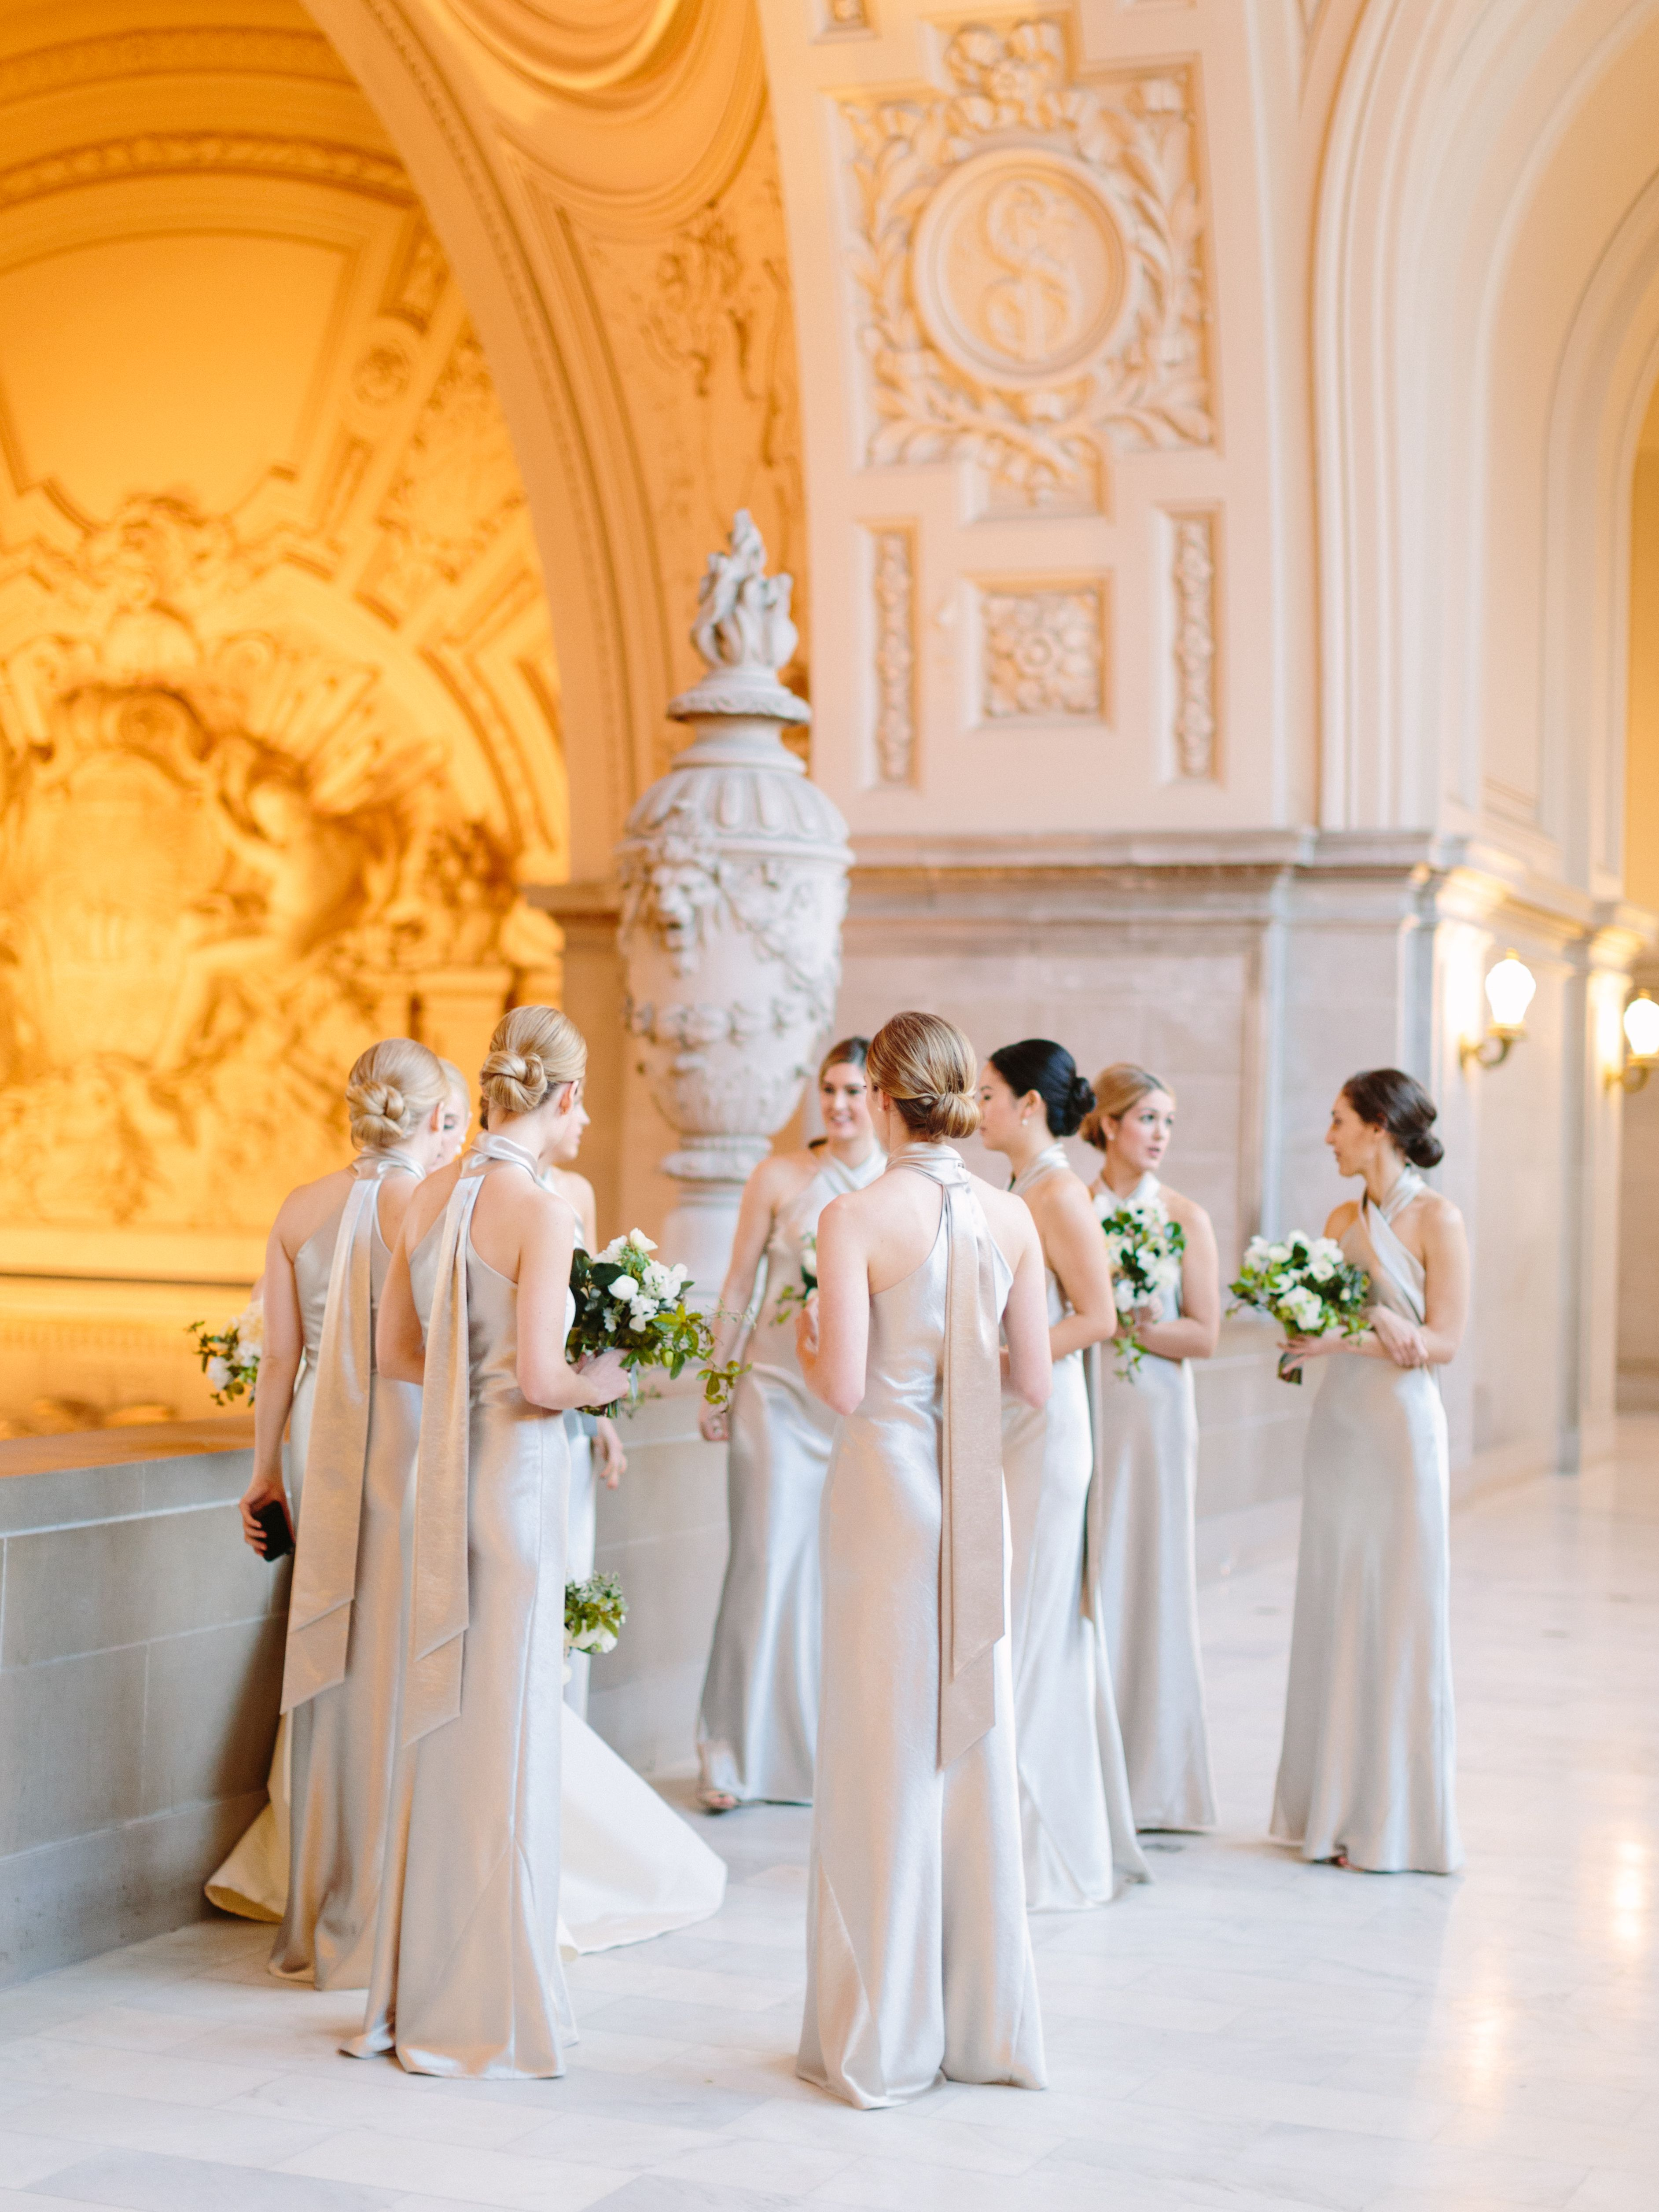 Beautiful Galvanbride Sidney Has Chosen Galvan London Bridesmaid Dresses For Her Wedding London Bride Bridesmaid Dresses Bridal